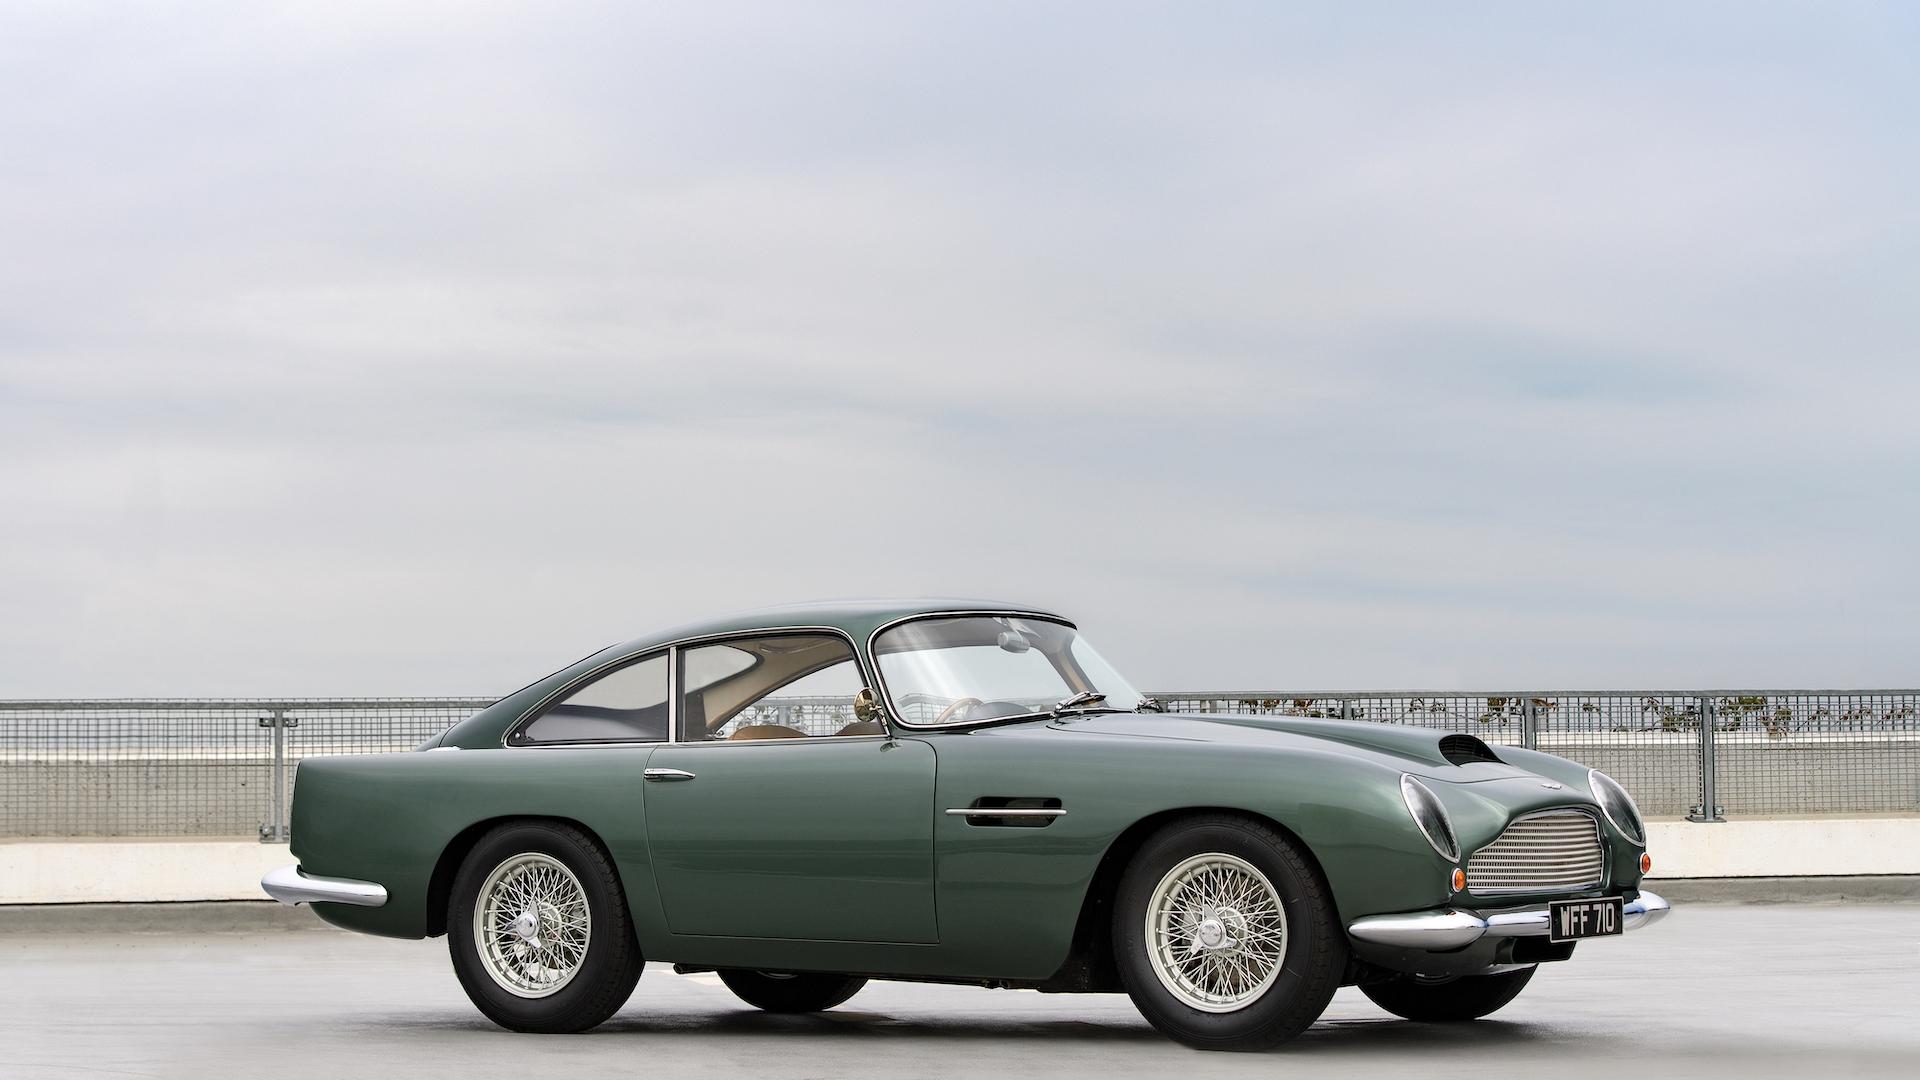 1961 Aston Martin DB4 GT Photo: RM Sotheby's